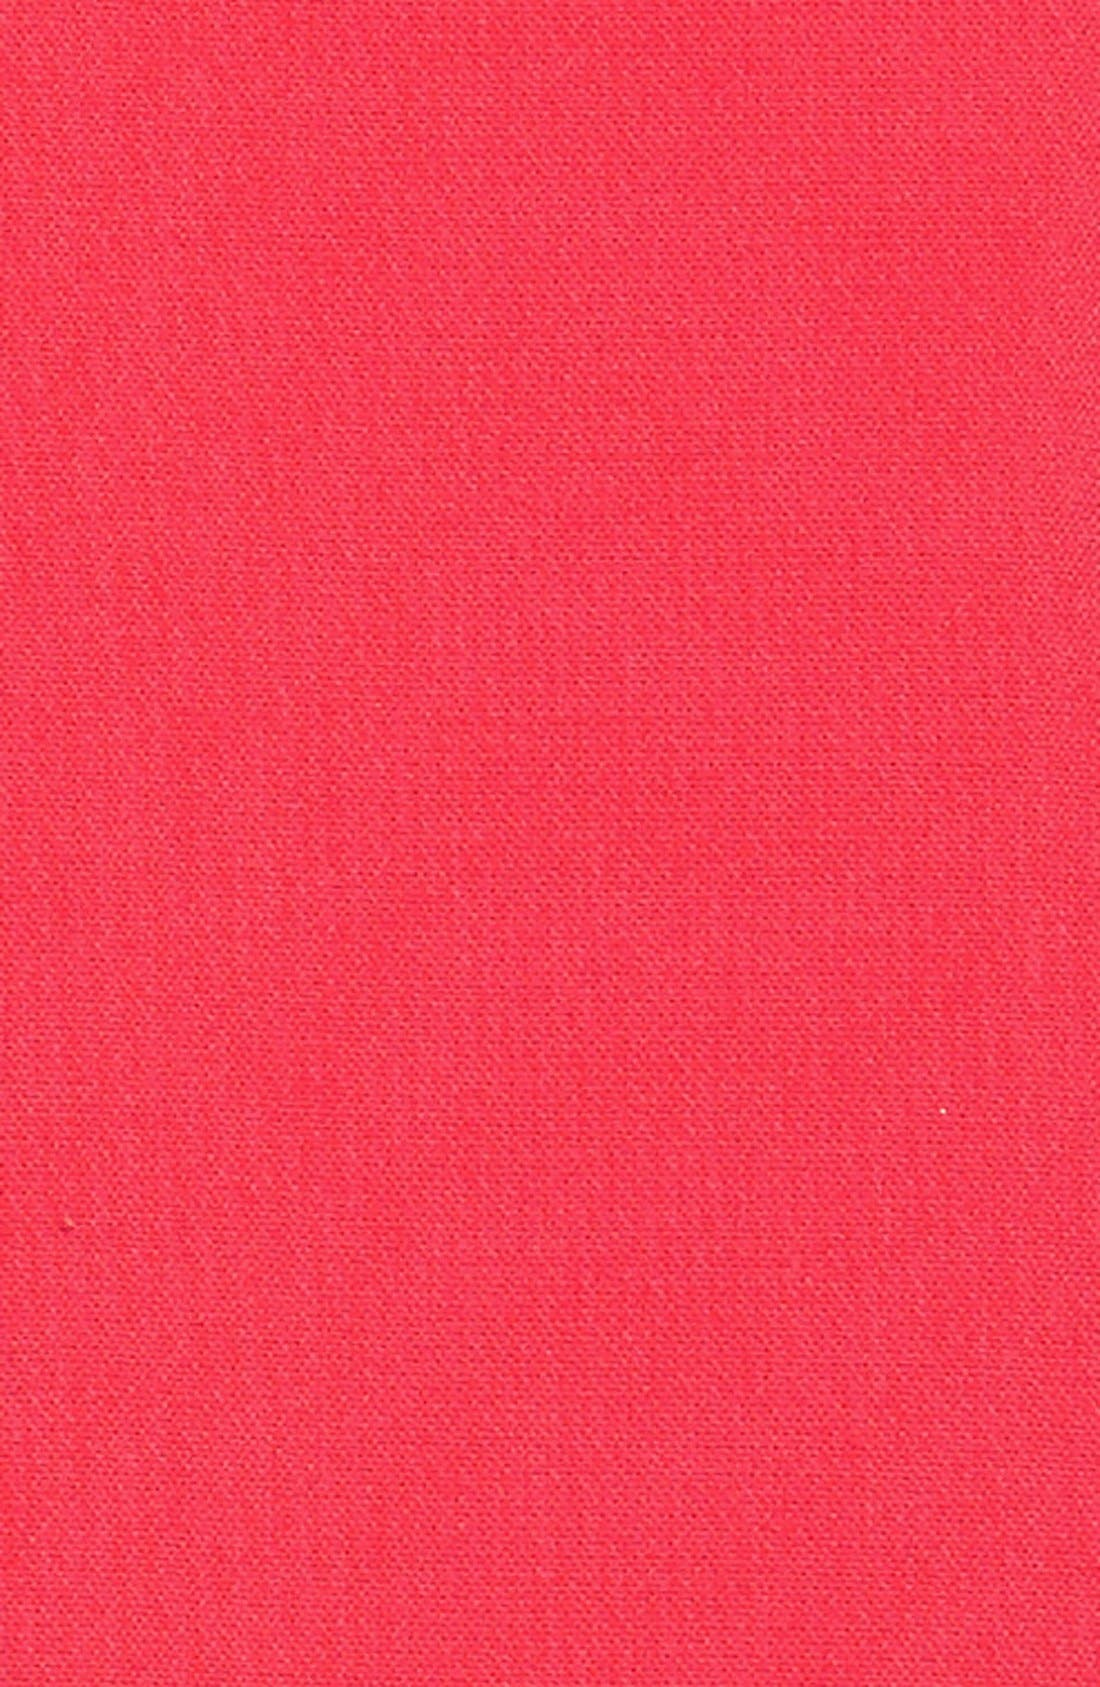 Alternate Image 5  - Ellen Tracy Double Weave Coatdress (Regular & Petite)